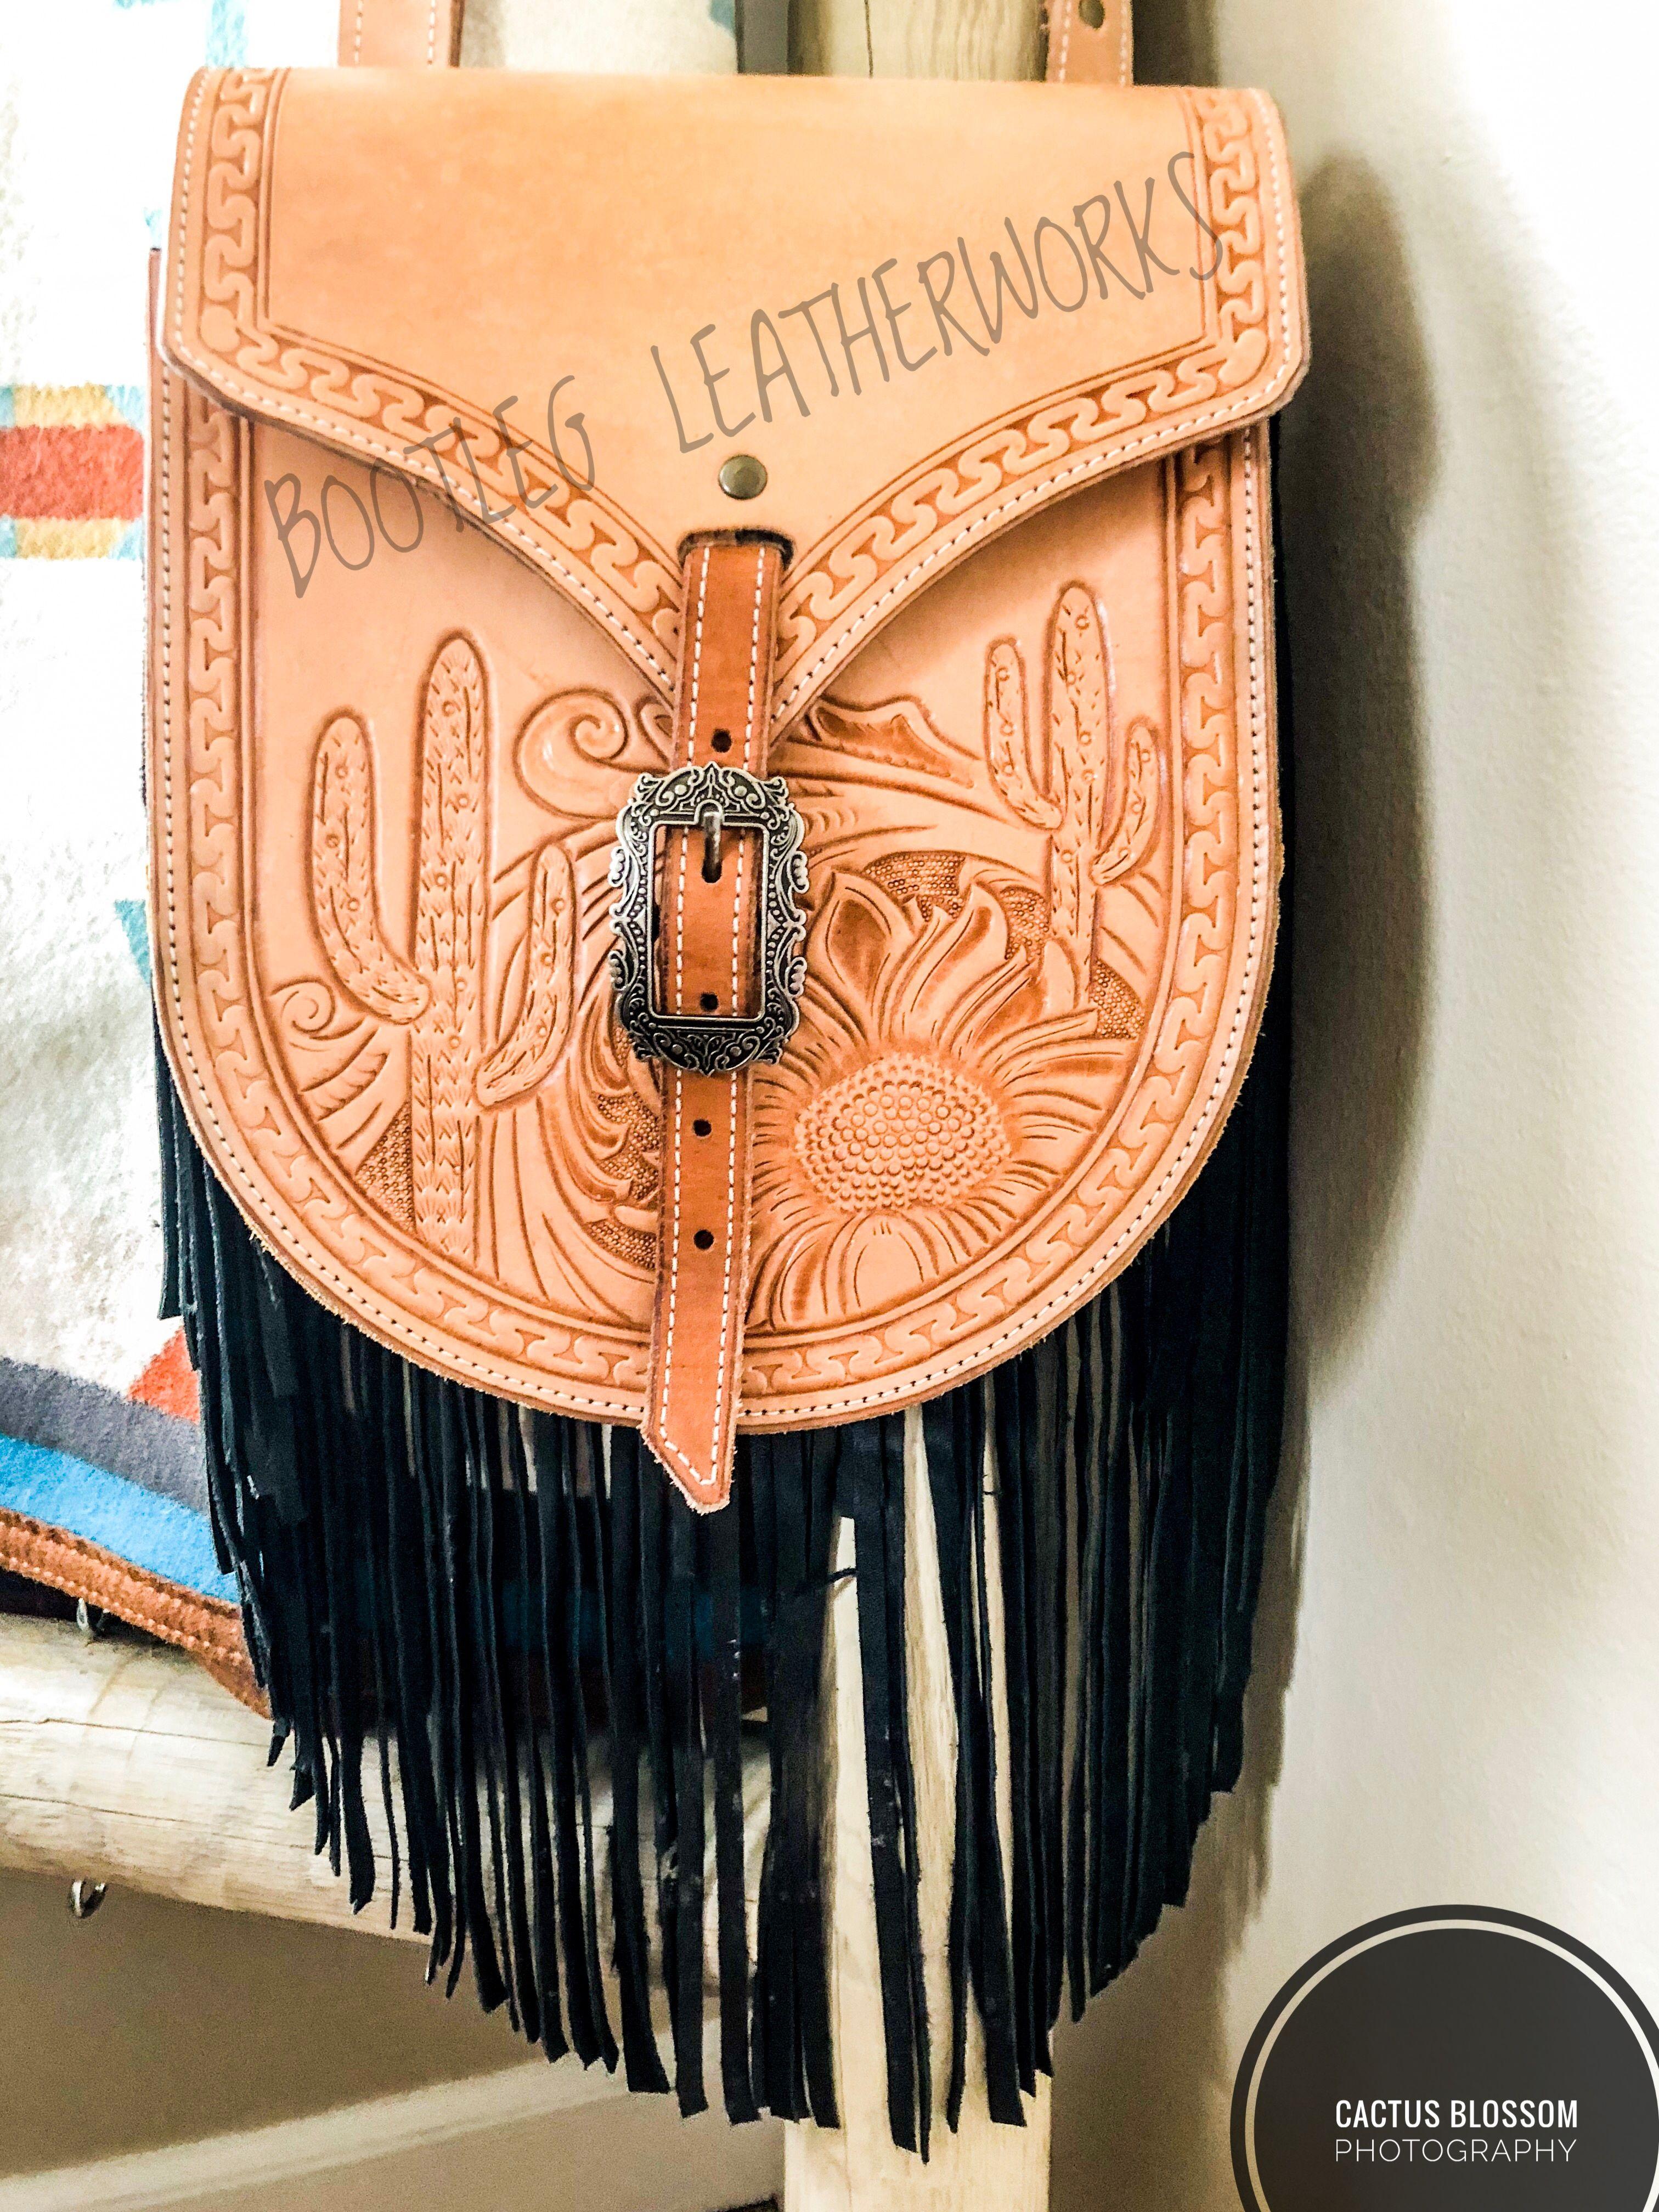 c7e494b7e0d7 Bootleg Leatherworks custom leather saddle bag purse with sunflowers,  cactus and fringe